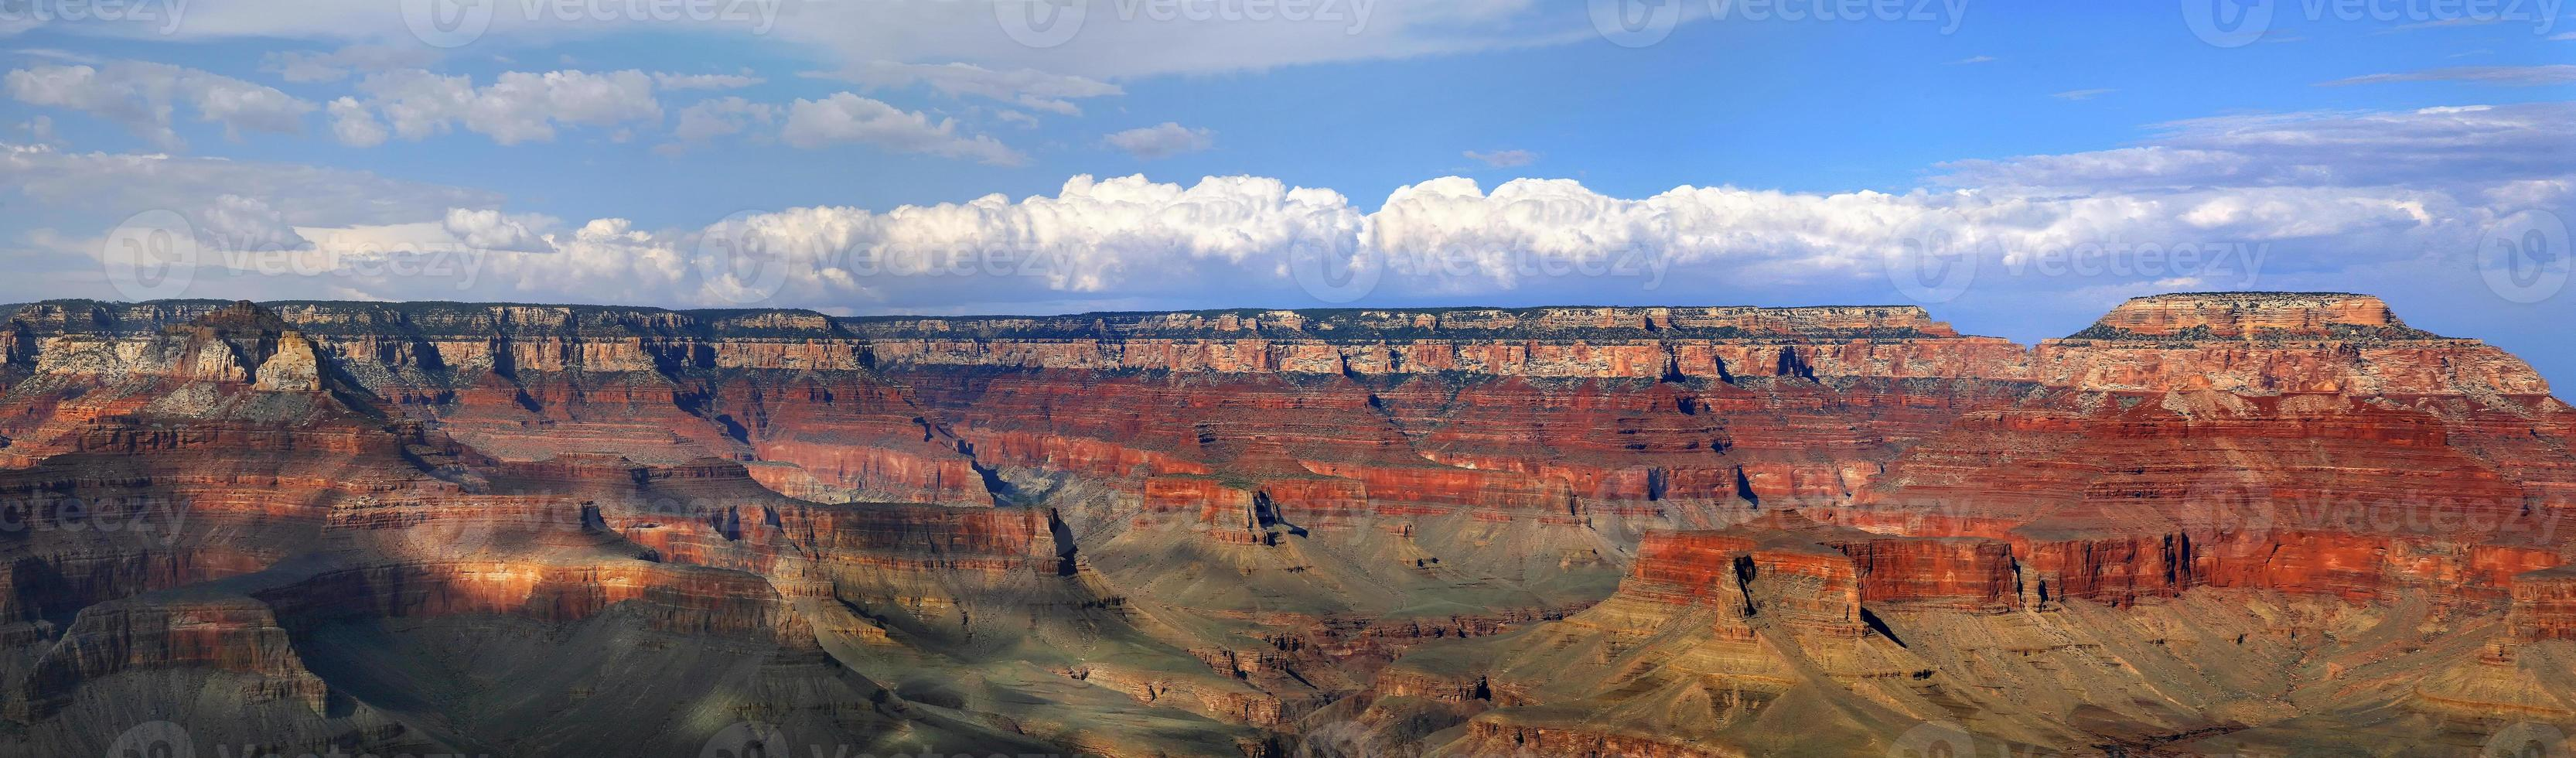 nationaal park grand canyon (zuidrand), arizona usa - landschap foto